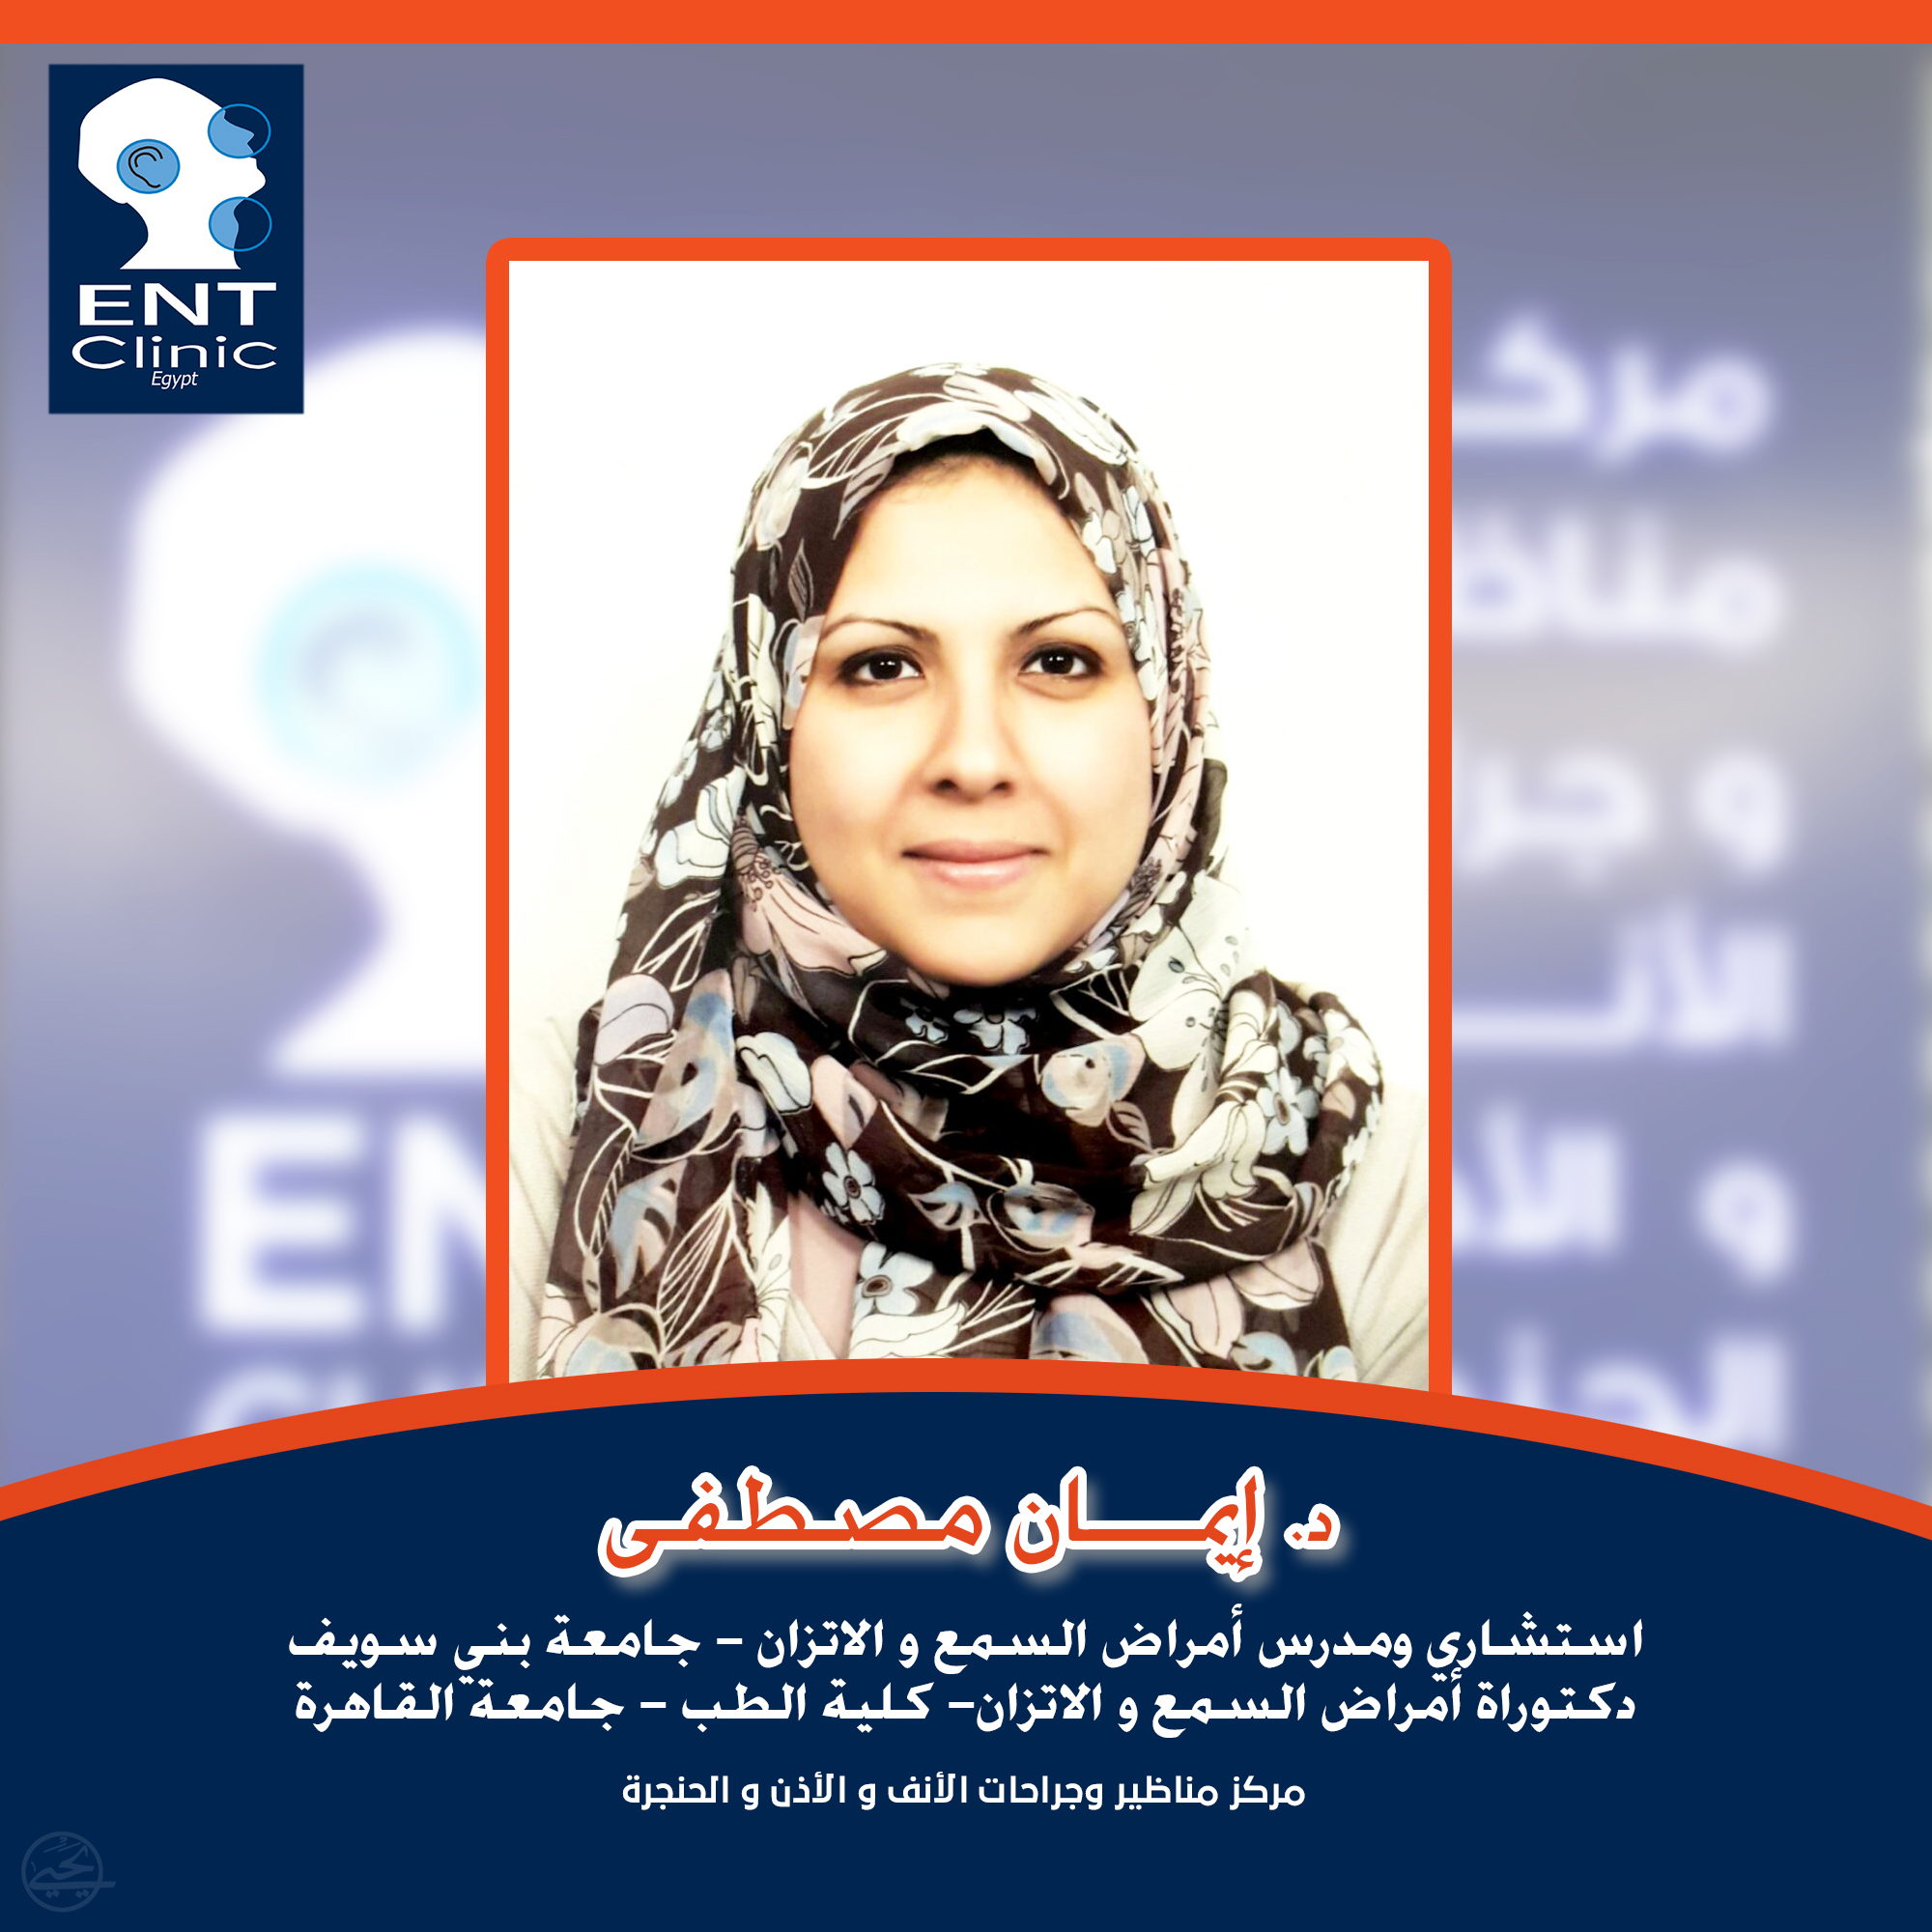 Eman Mostafa